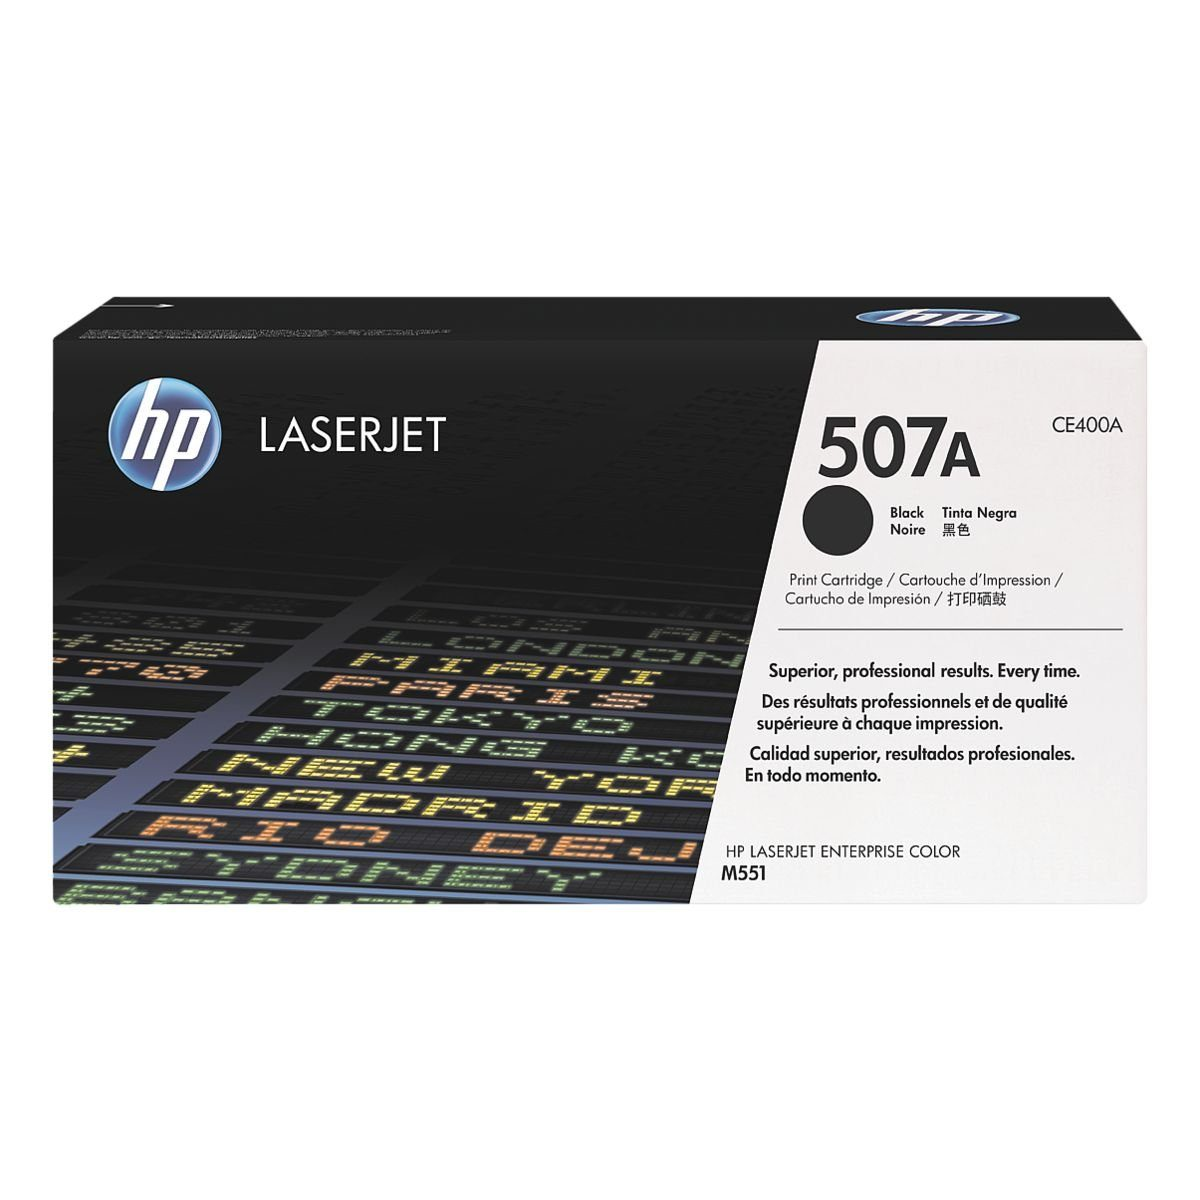 HP Druckkassette »CE400A« 507A